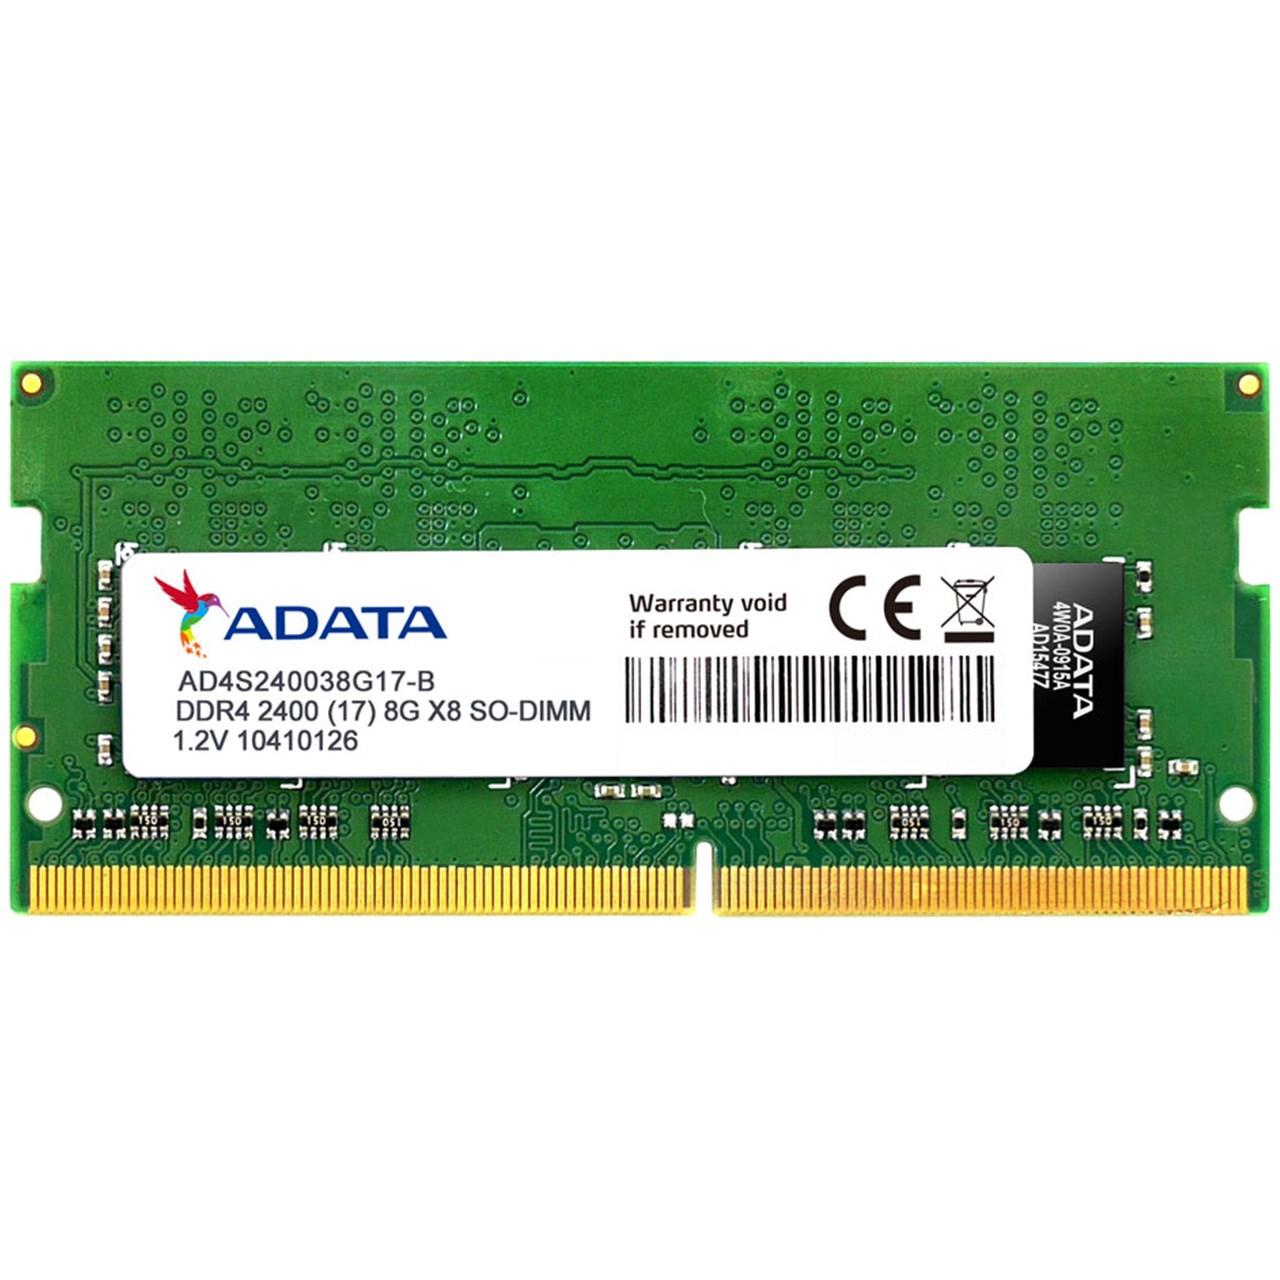 رم لپ تاپ ای دیتا مدل DDR4 2400MHz ظرفیت 8 گیگابایت | Adata DDR4 2400MHz SODIMM RAM - 8GB